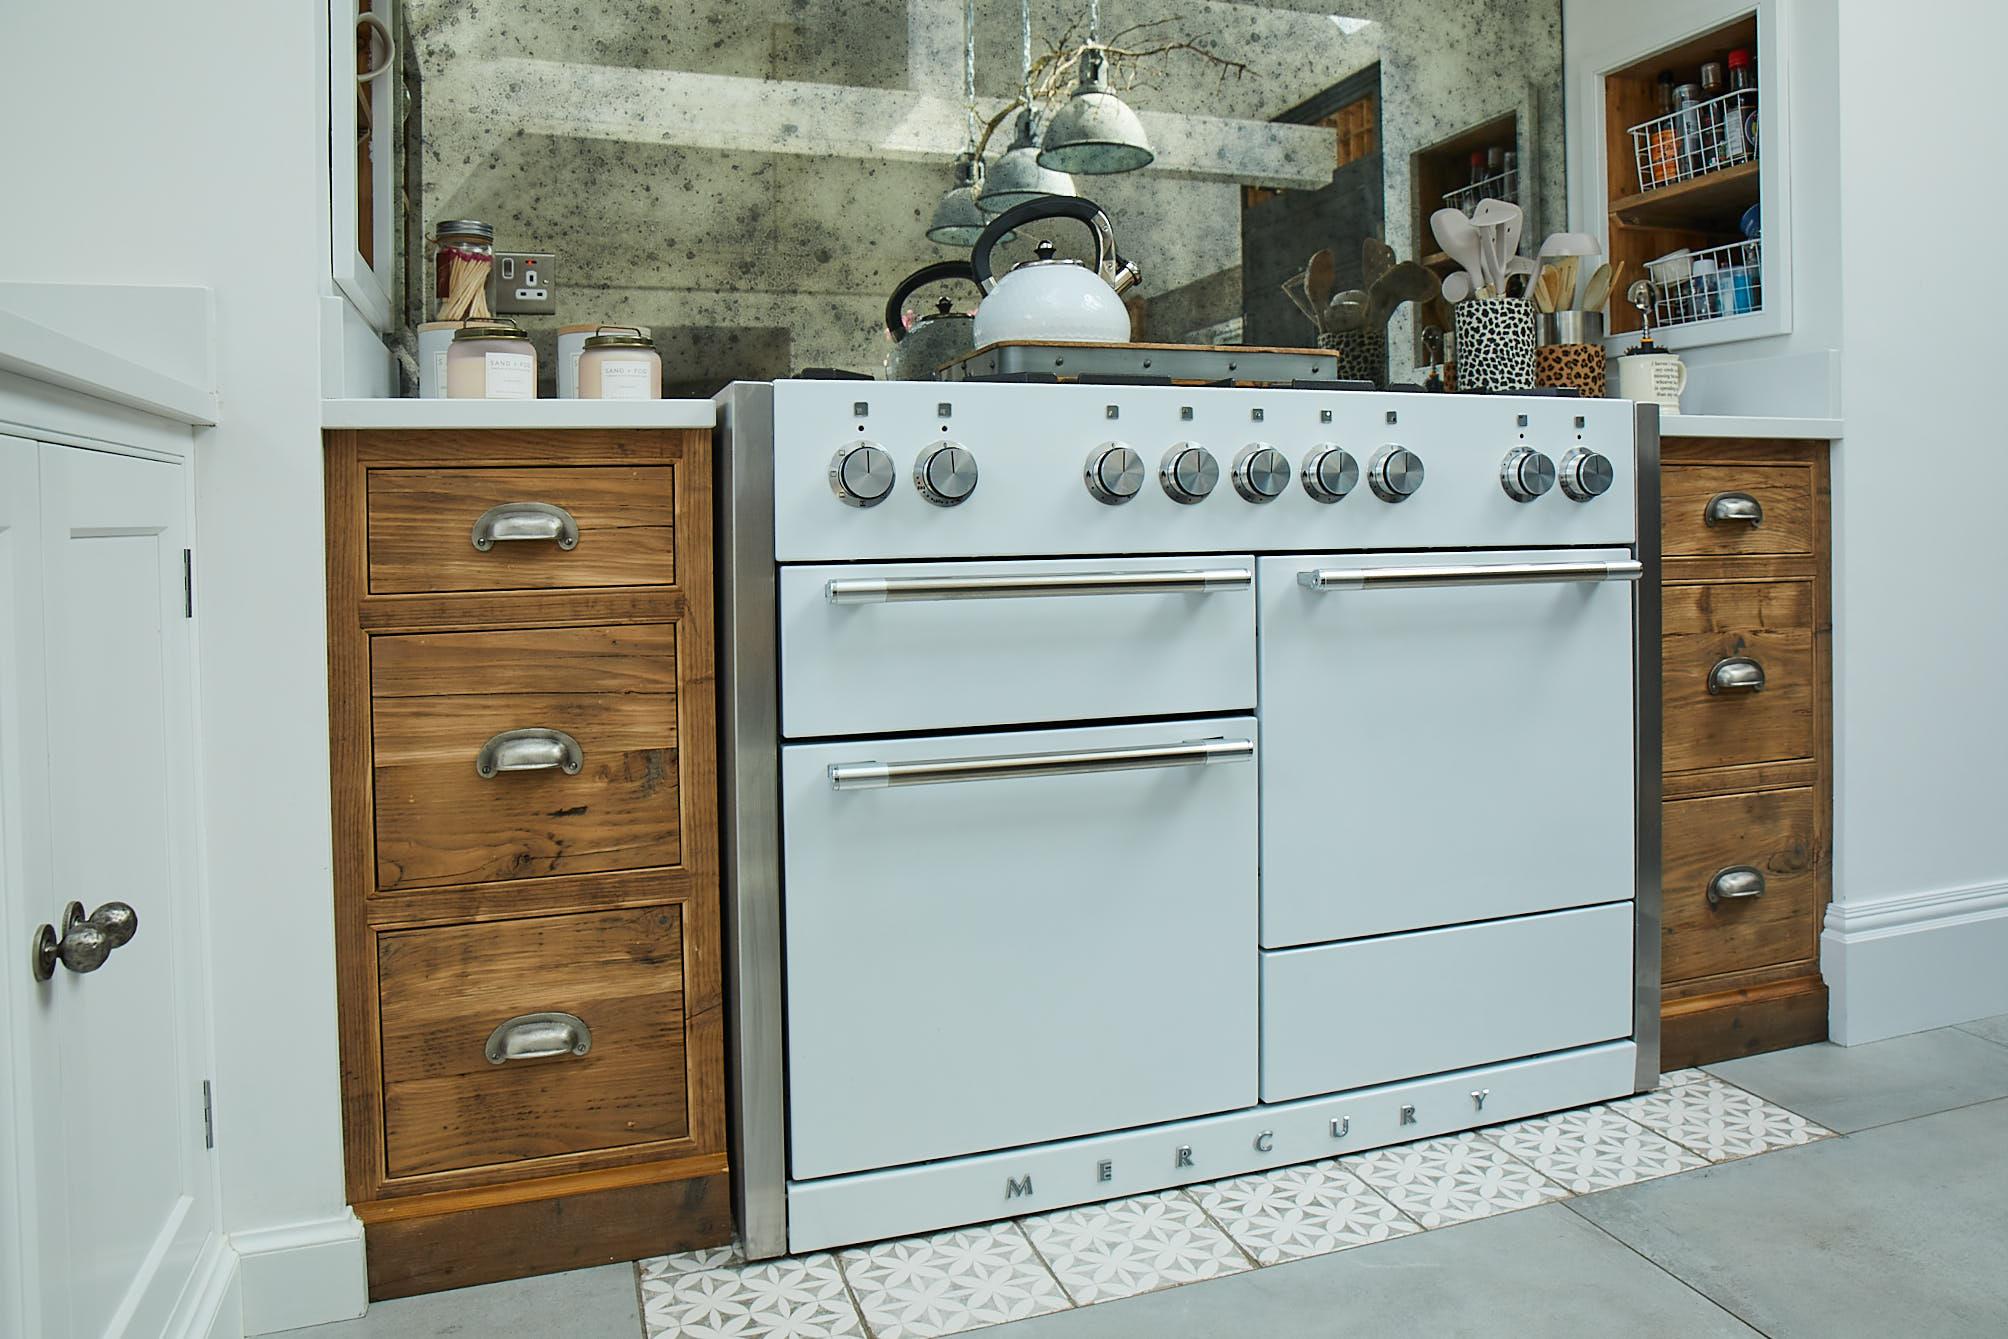 Rustic pan drawers beside white range cooker with antique mirror backsplash